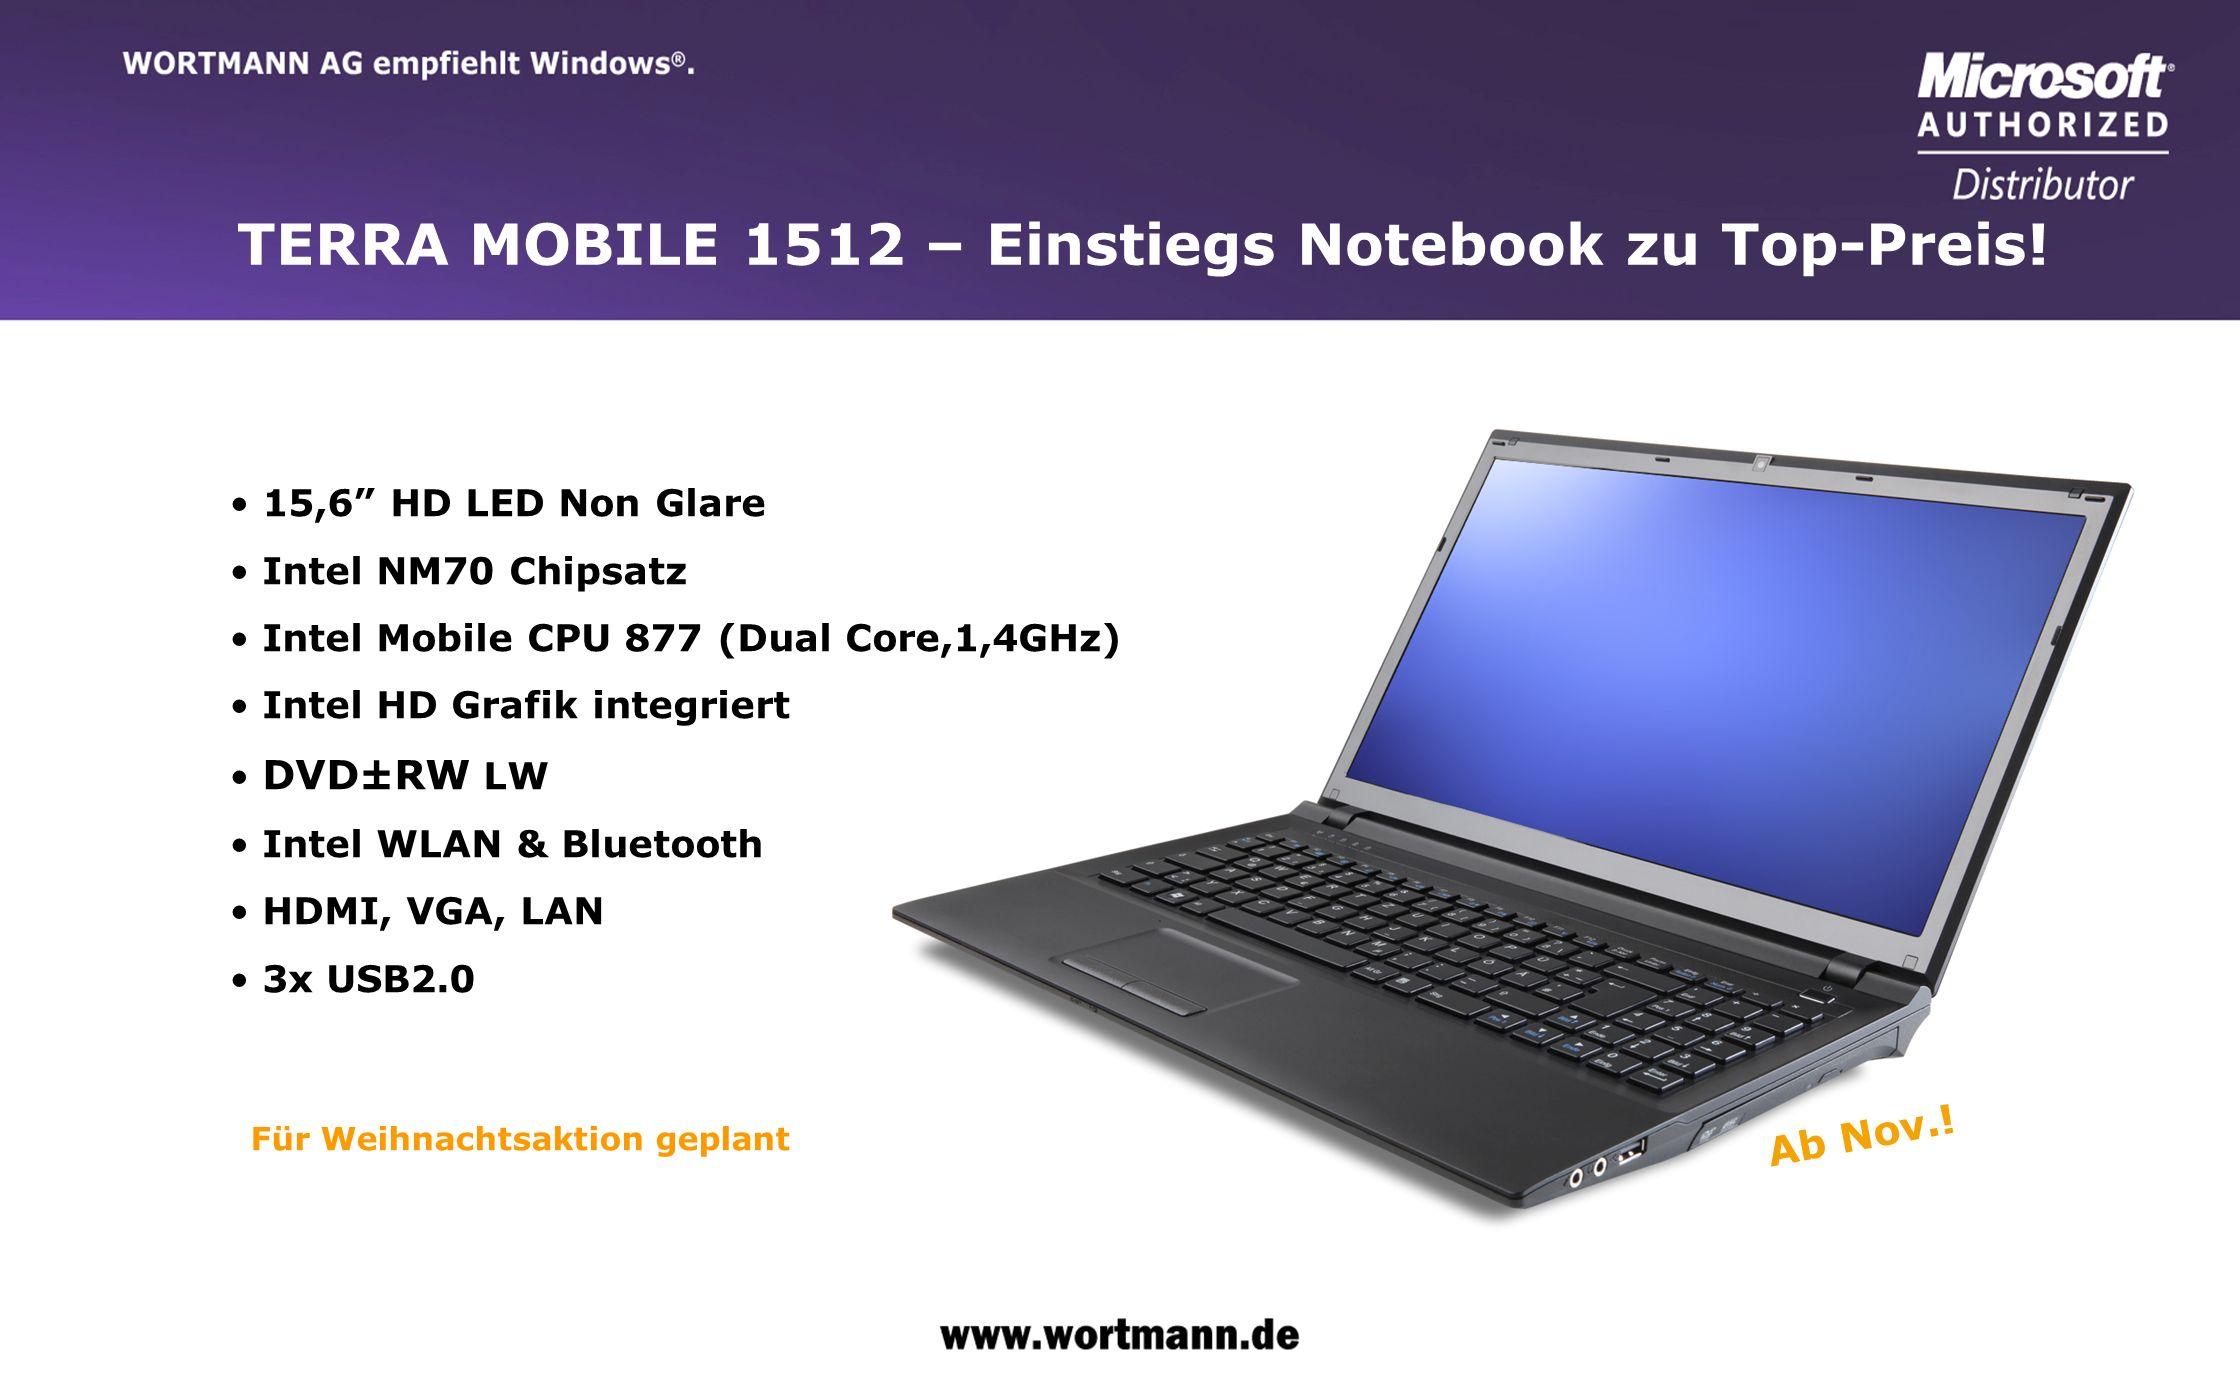 www.wortmann.de TERRA MOBILE 1512 – Einstiegs Notebook zu Top-Preis! 15,6 HD LED Non Glare Intel NM70 Chipsatz Intel Mobile CPU 877 (Dual Core,1,4GHz)